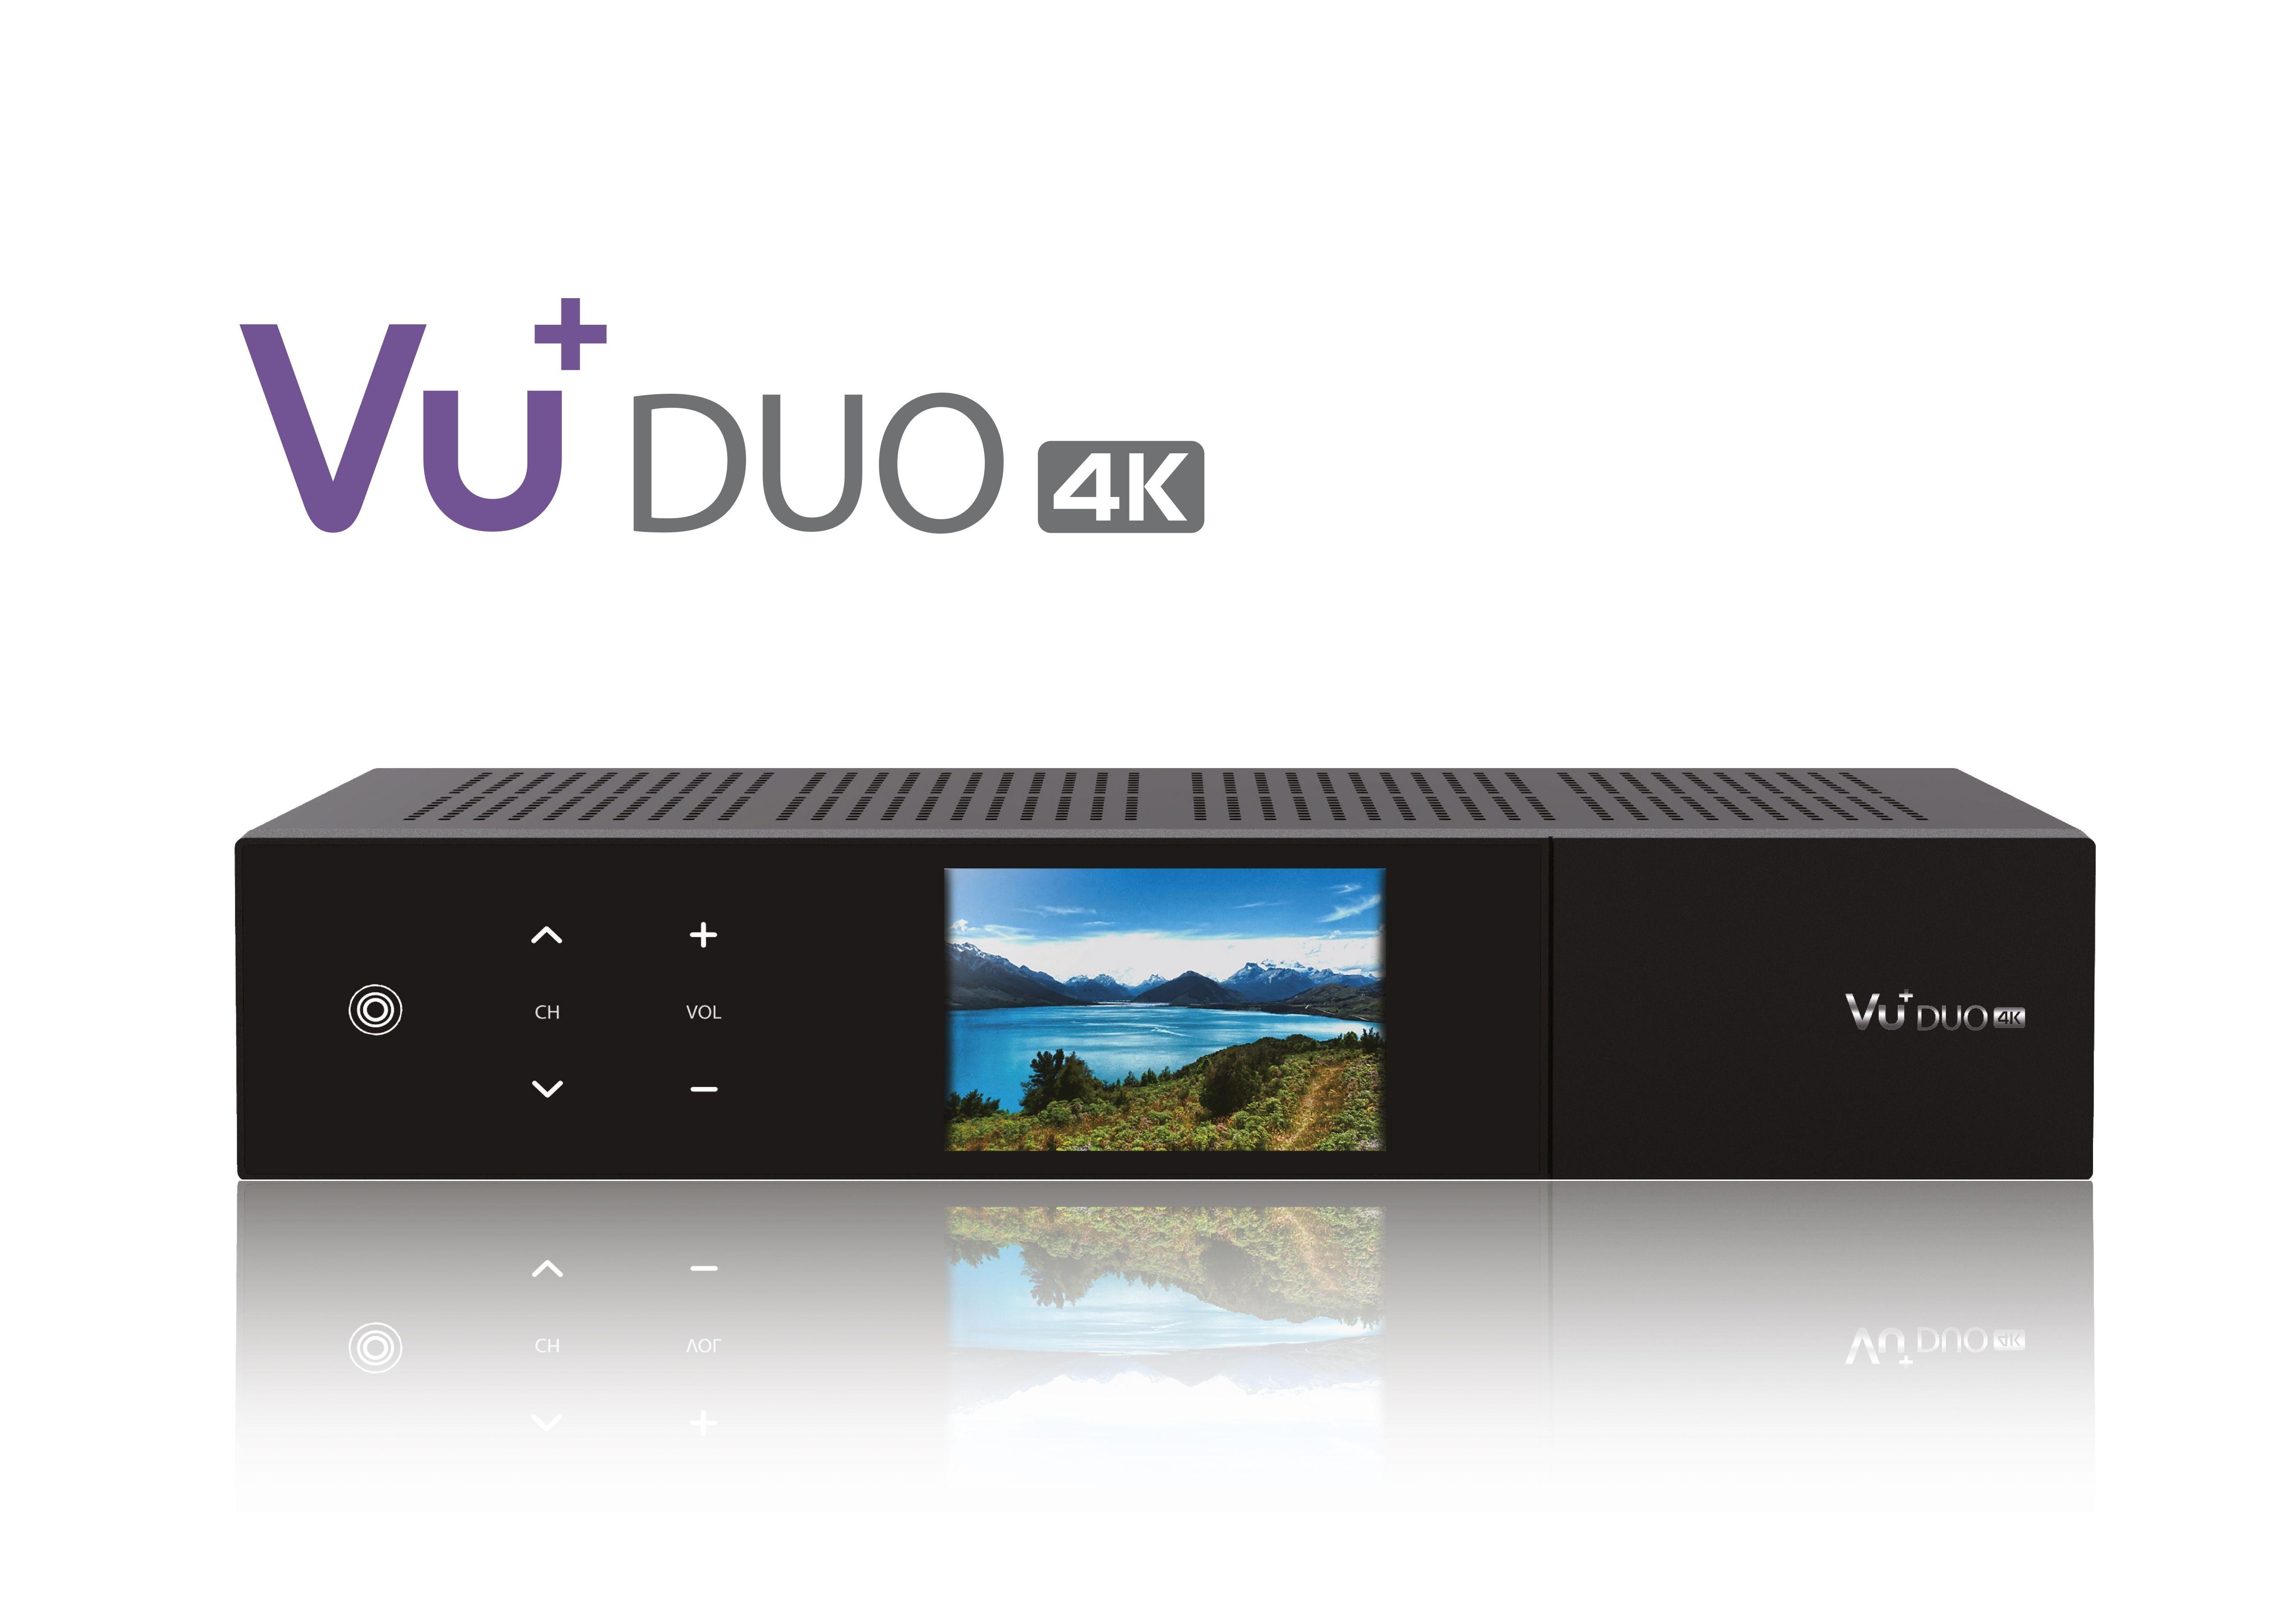 VU+ Duo 4K 1x DVB-C FBC / 1x DVB-T2 Dual Tuner PVR ready Linux Receiver UHD 2160p